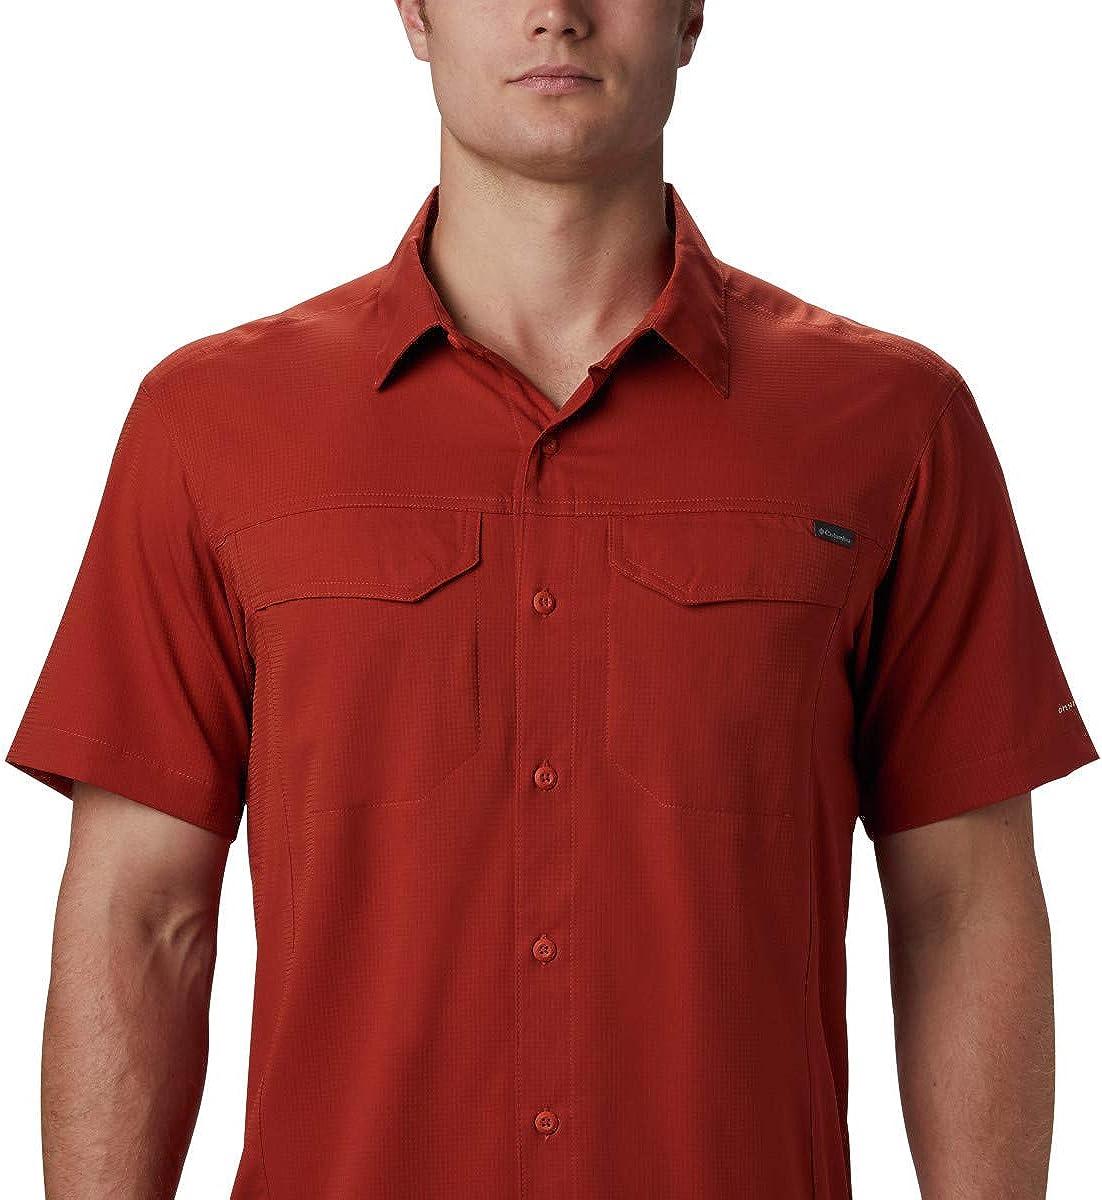 COLUMBIA Silver Ridge 2.0 EM0648464 Outdoor Casual Short Sleeve Shirt Mens New